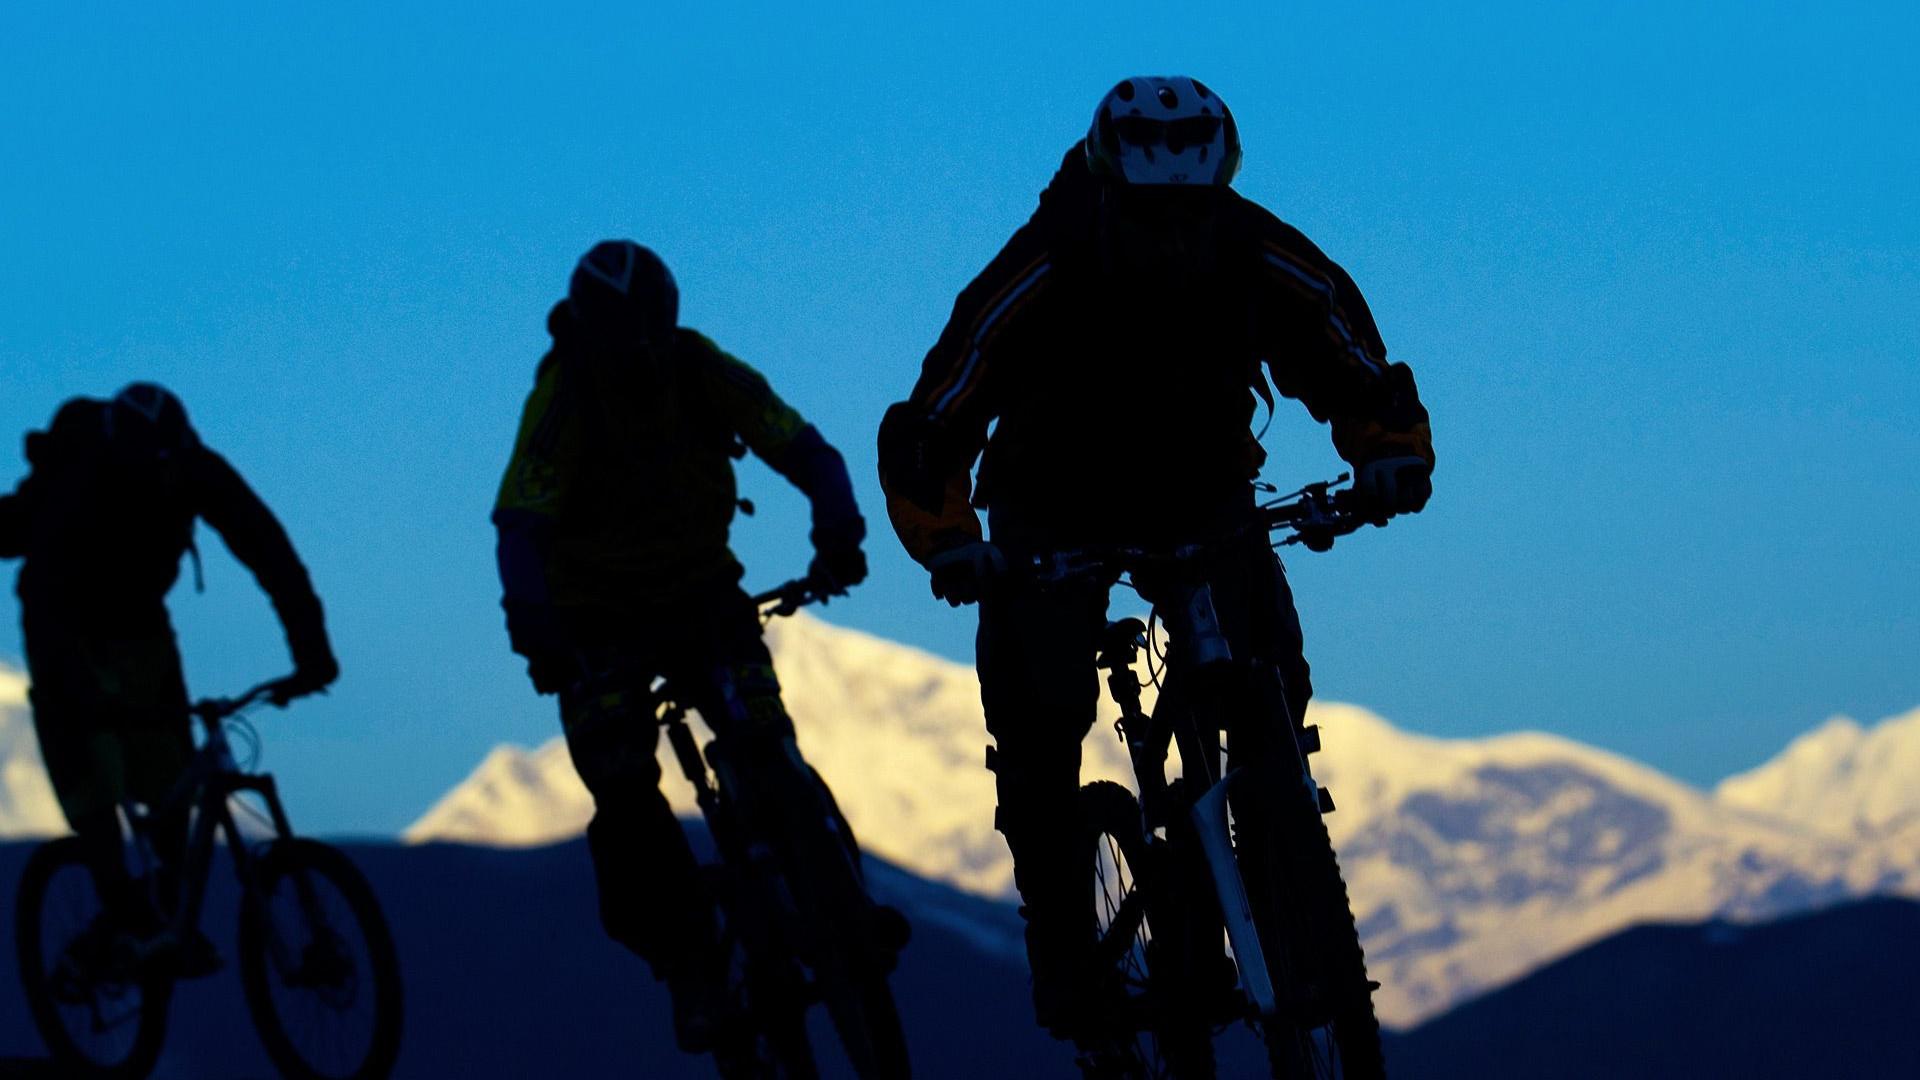 Bikes Silhouette